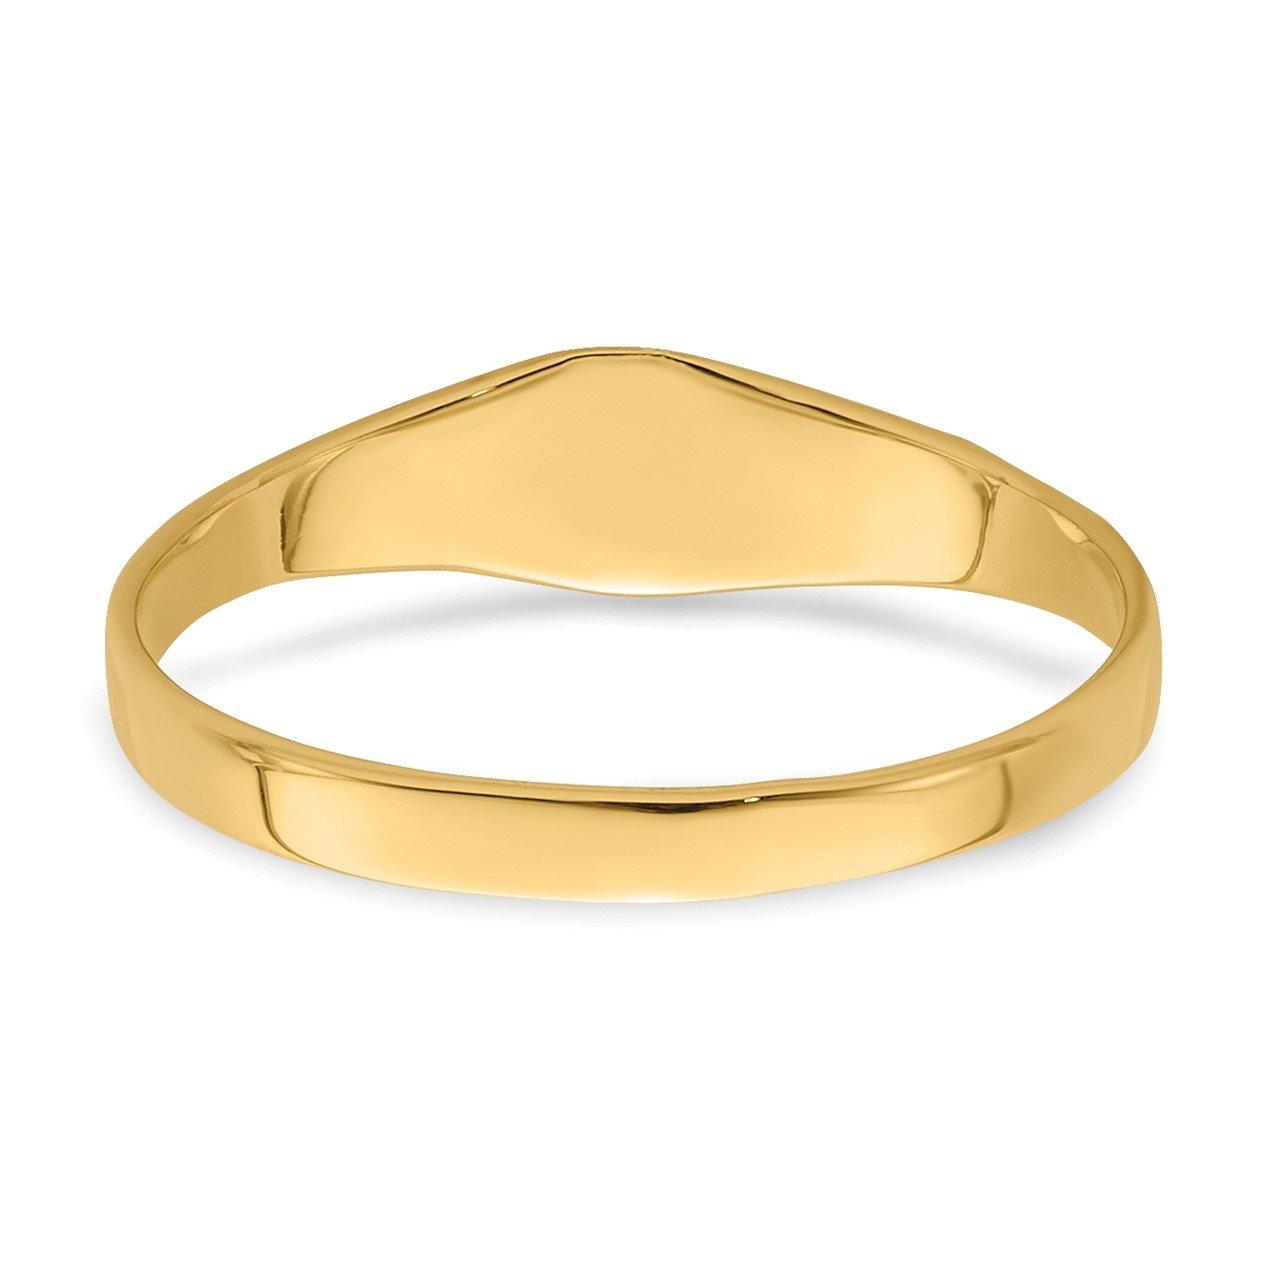 14K Polished Square Baby Signet Ring-5